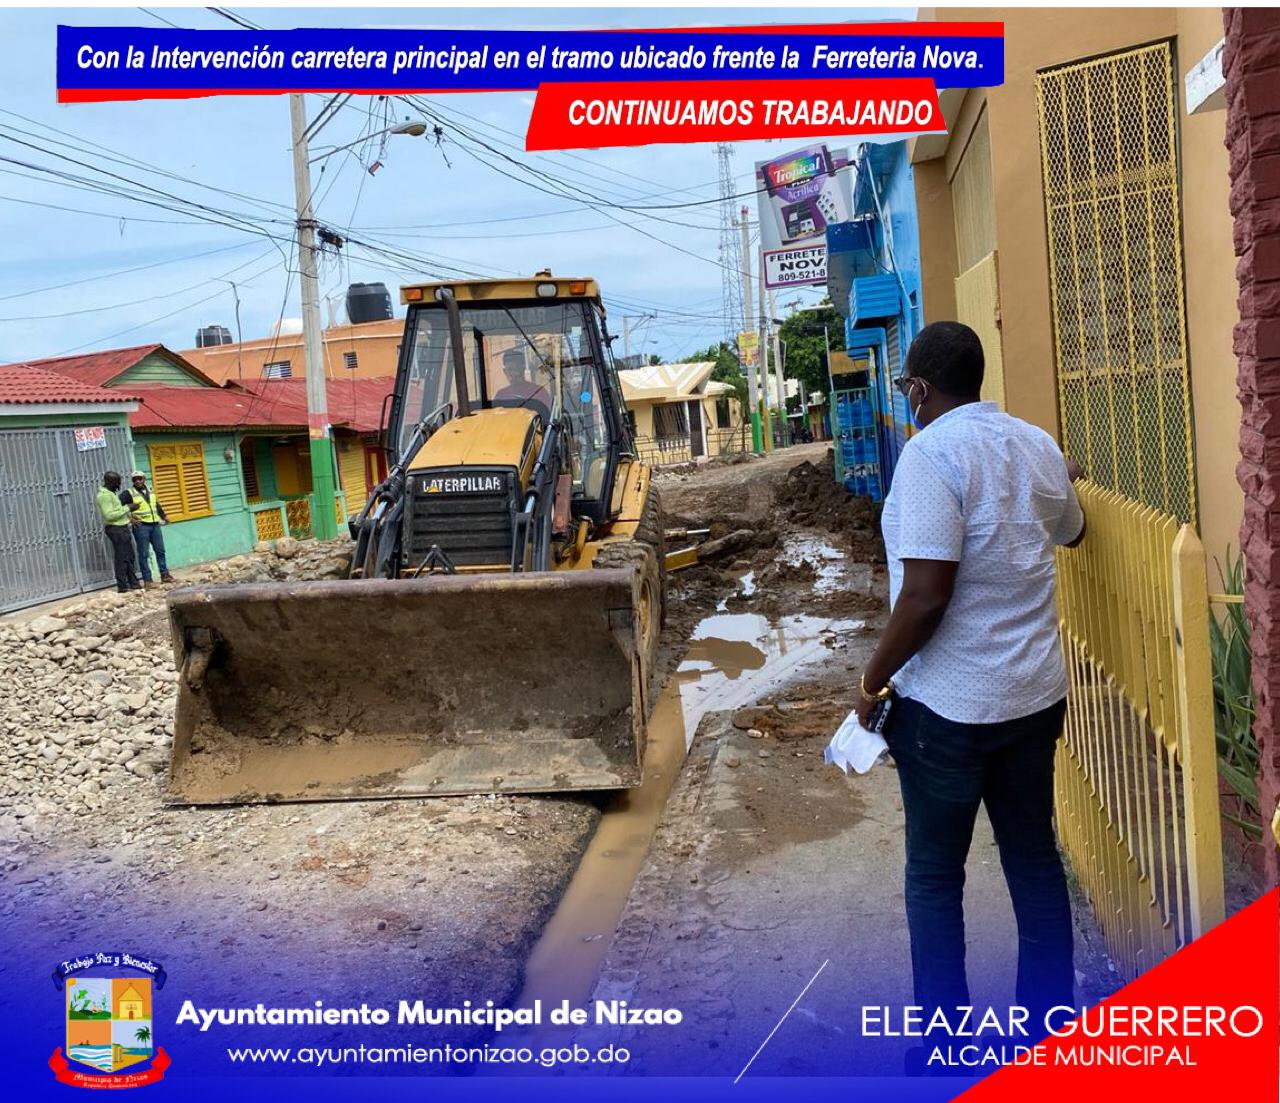 Eleazar Guerrero Alvino Alcalde Municipal: De Manera Simultanea La Alcaldia Del Municipio De Nizao